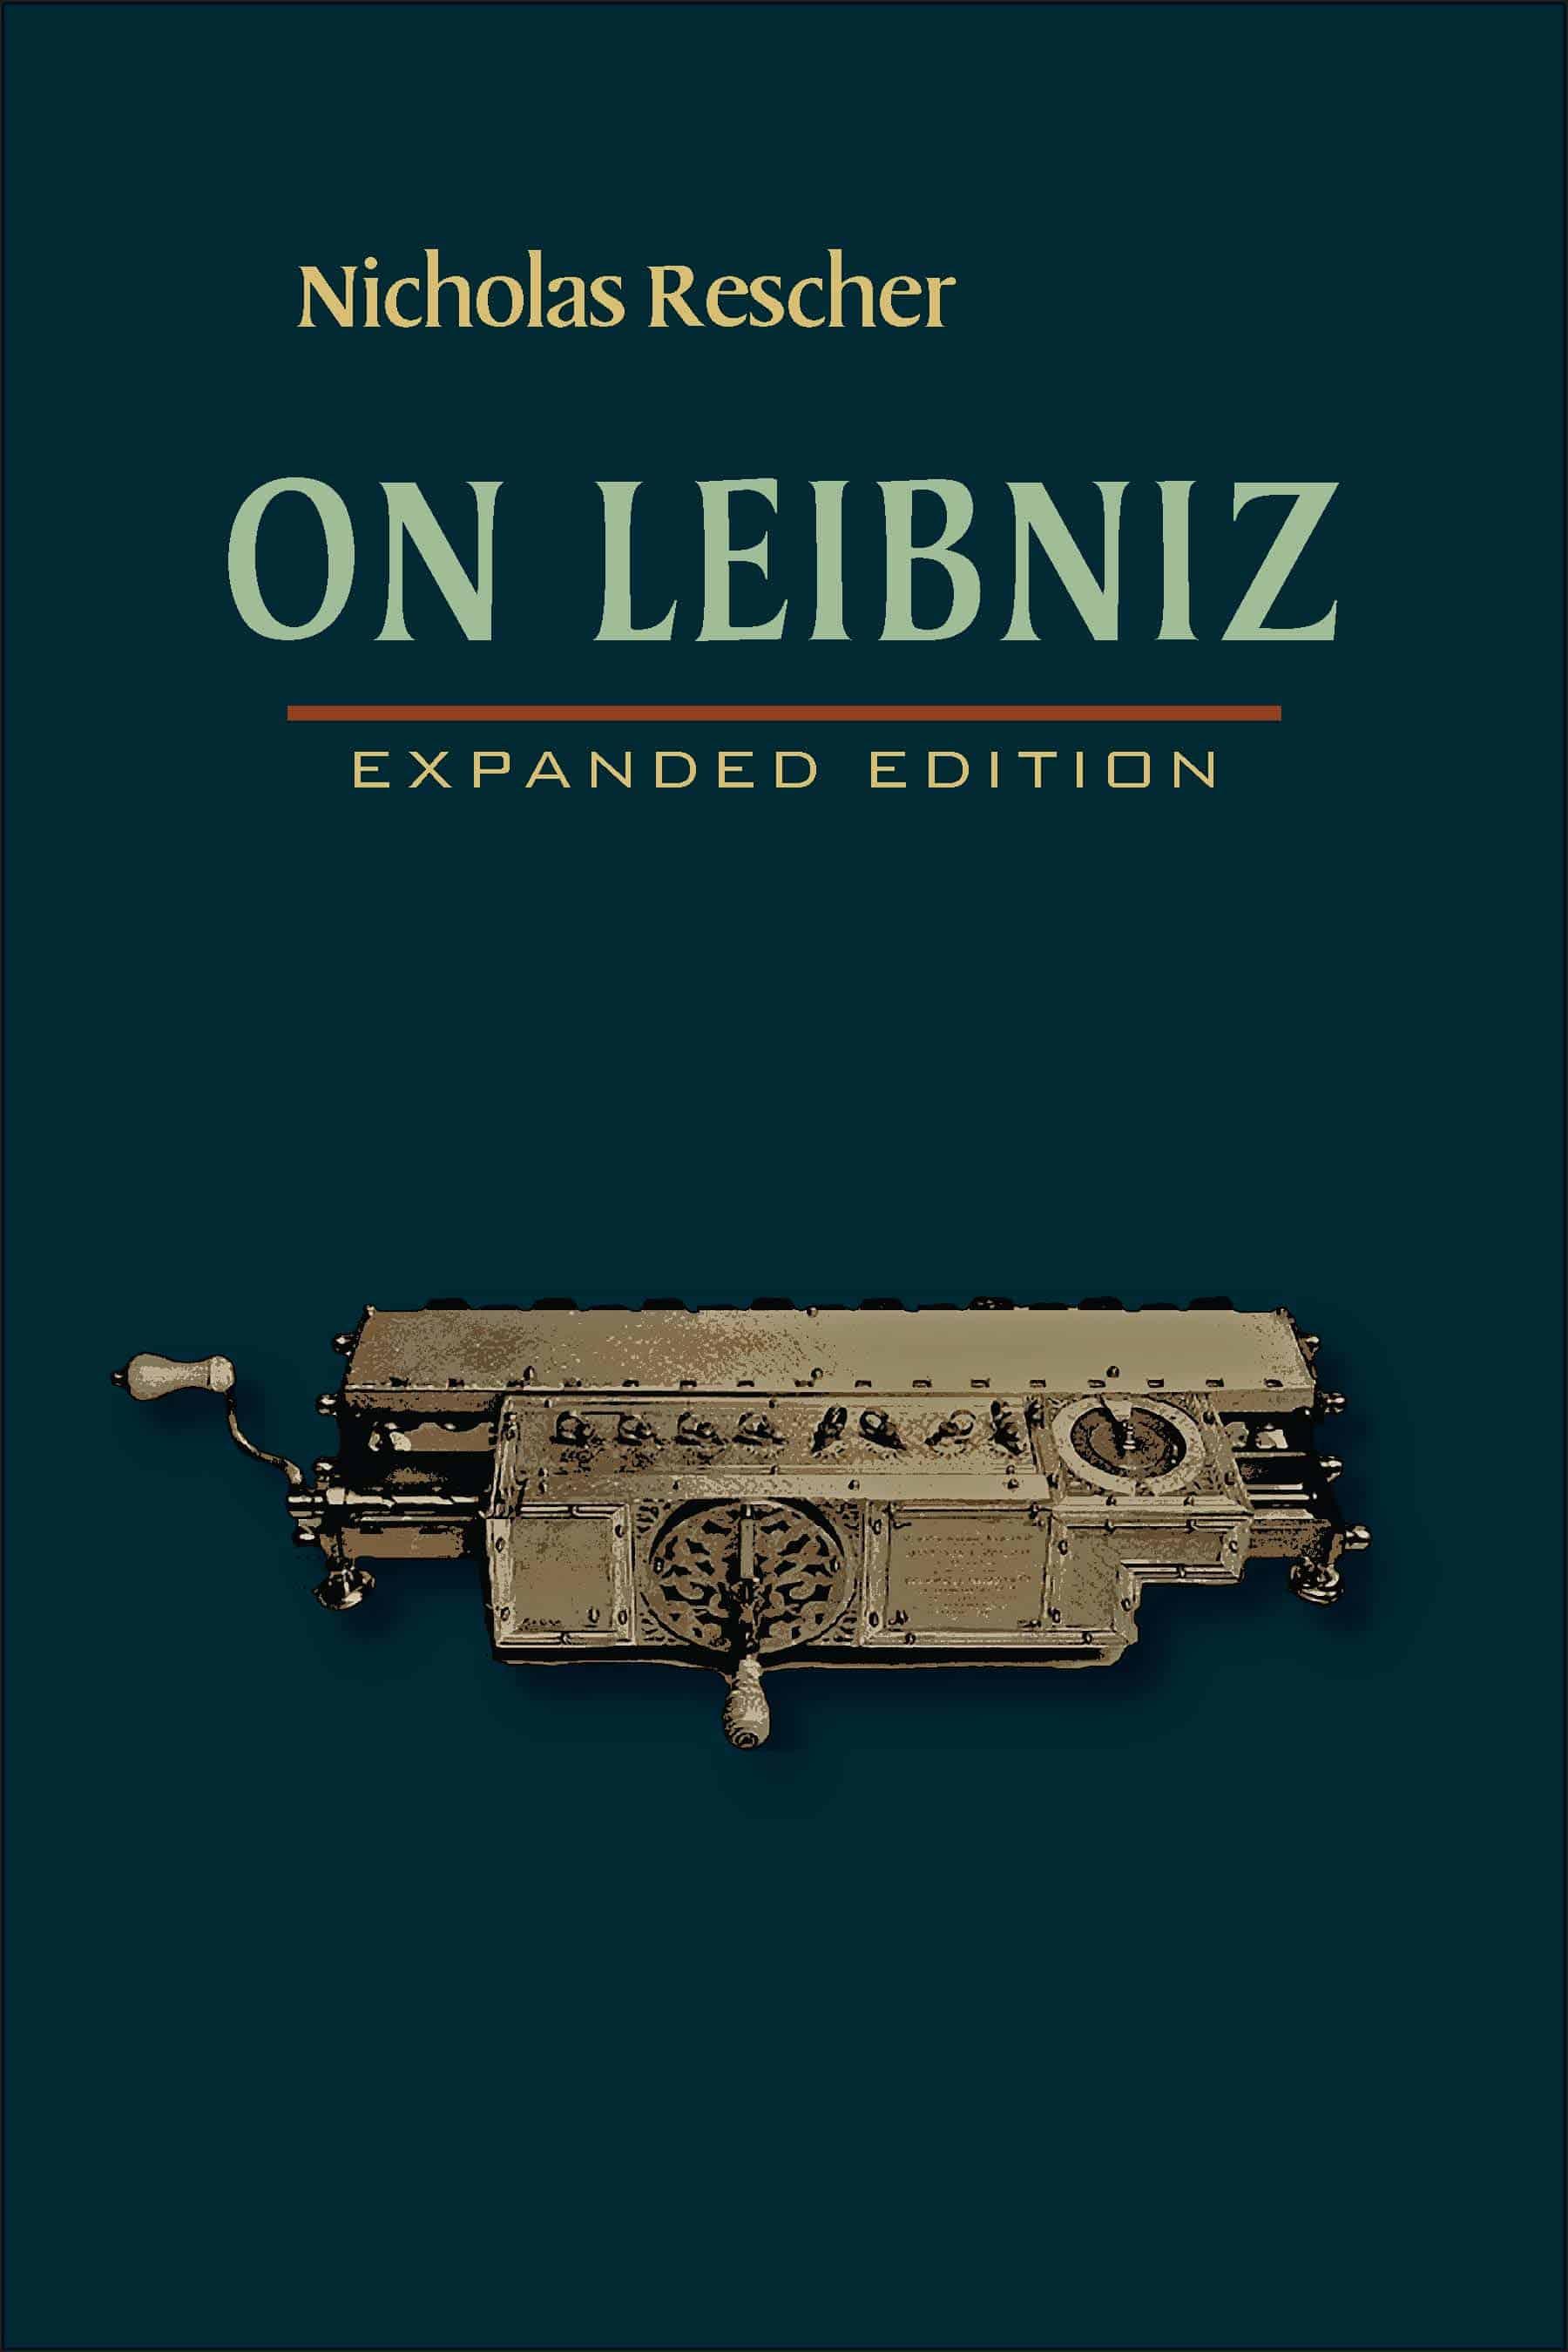 On Leibniz by Nicholas Rescher - On Leibniz